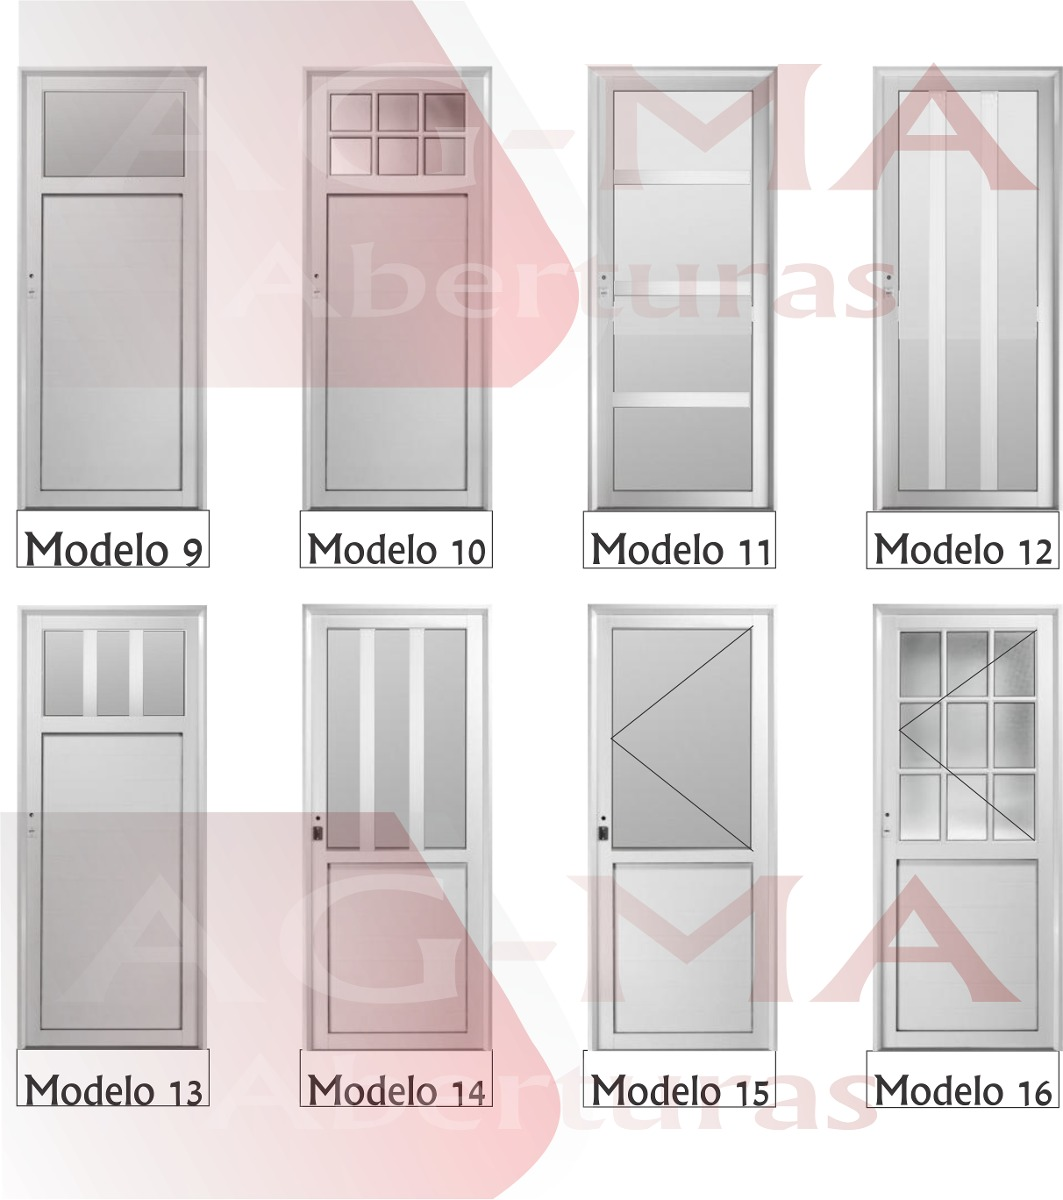 puertas aluminio bco vidrio repartido x cerradura